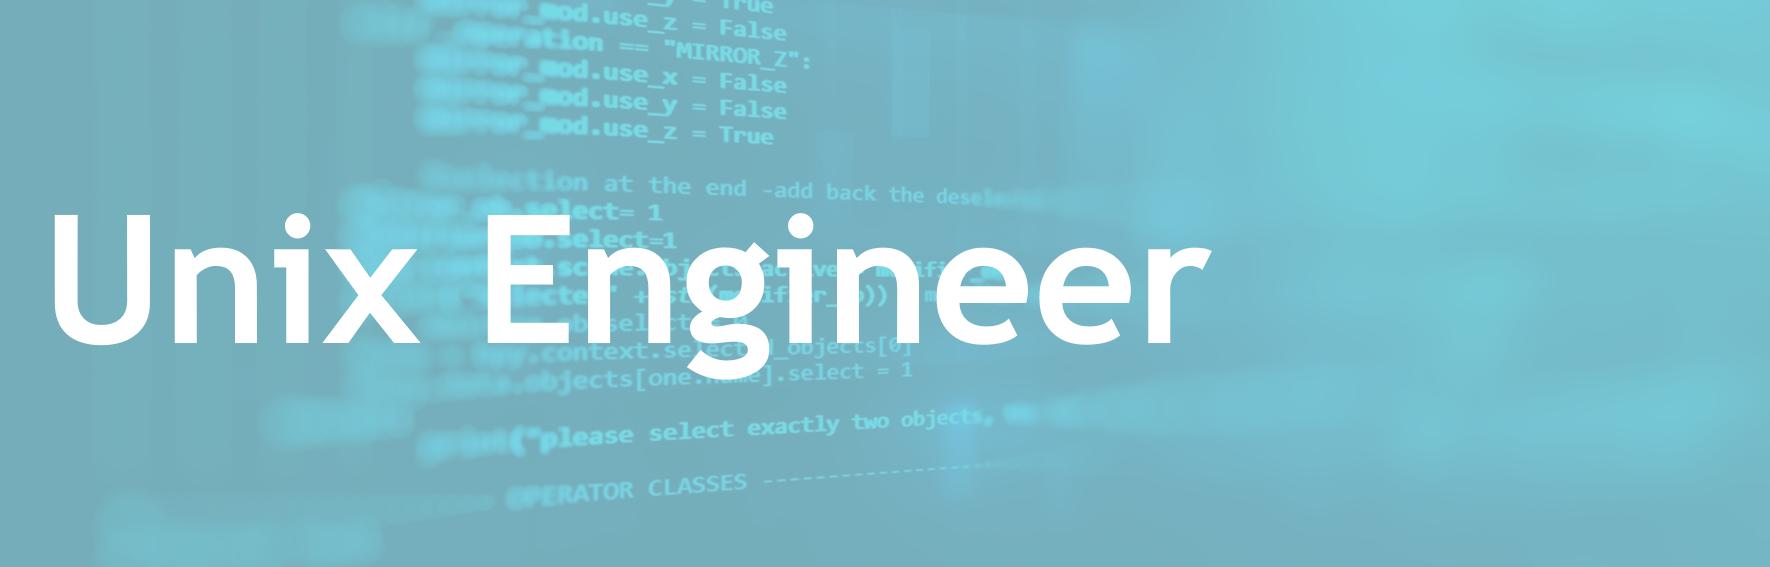 Unix Engineer - FR/EN